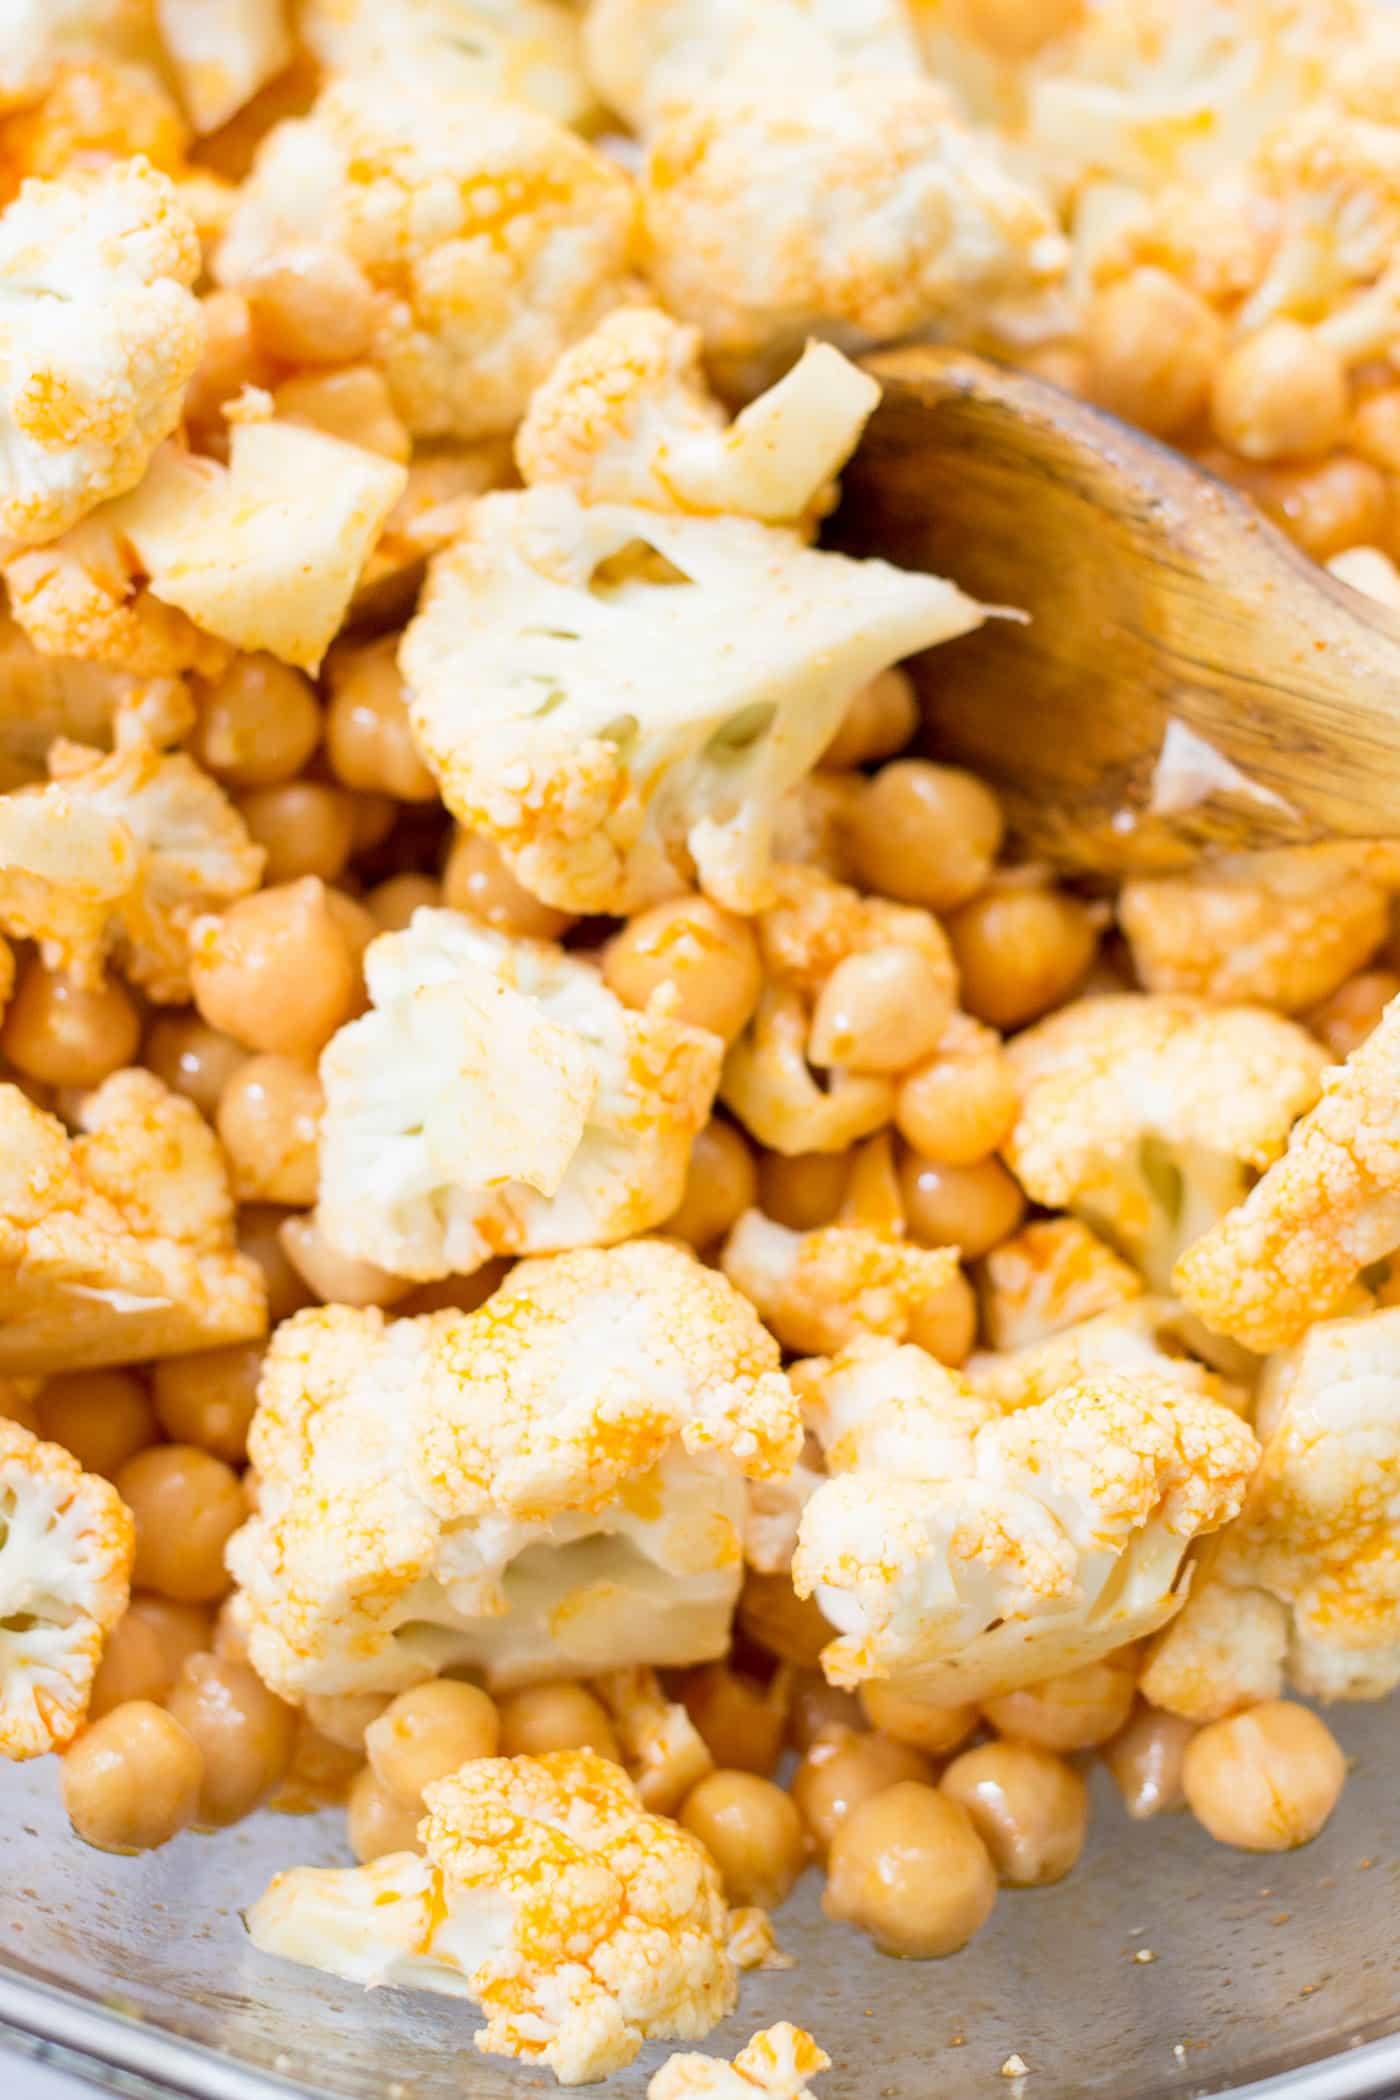 Cauliflower + Chickpeas make the BEST vegan taco filling!